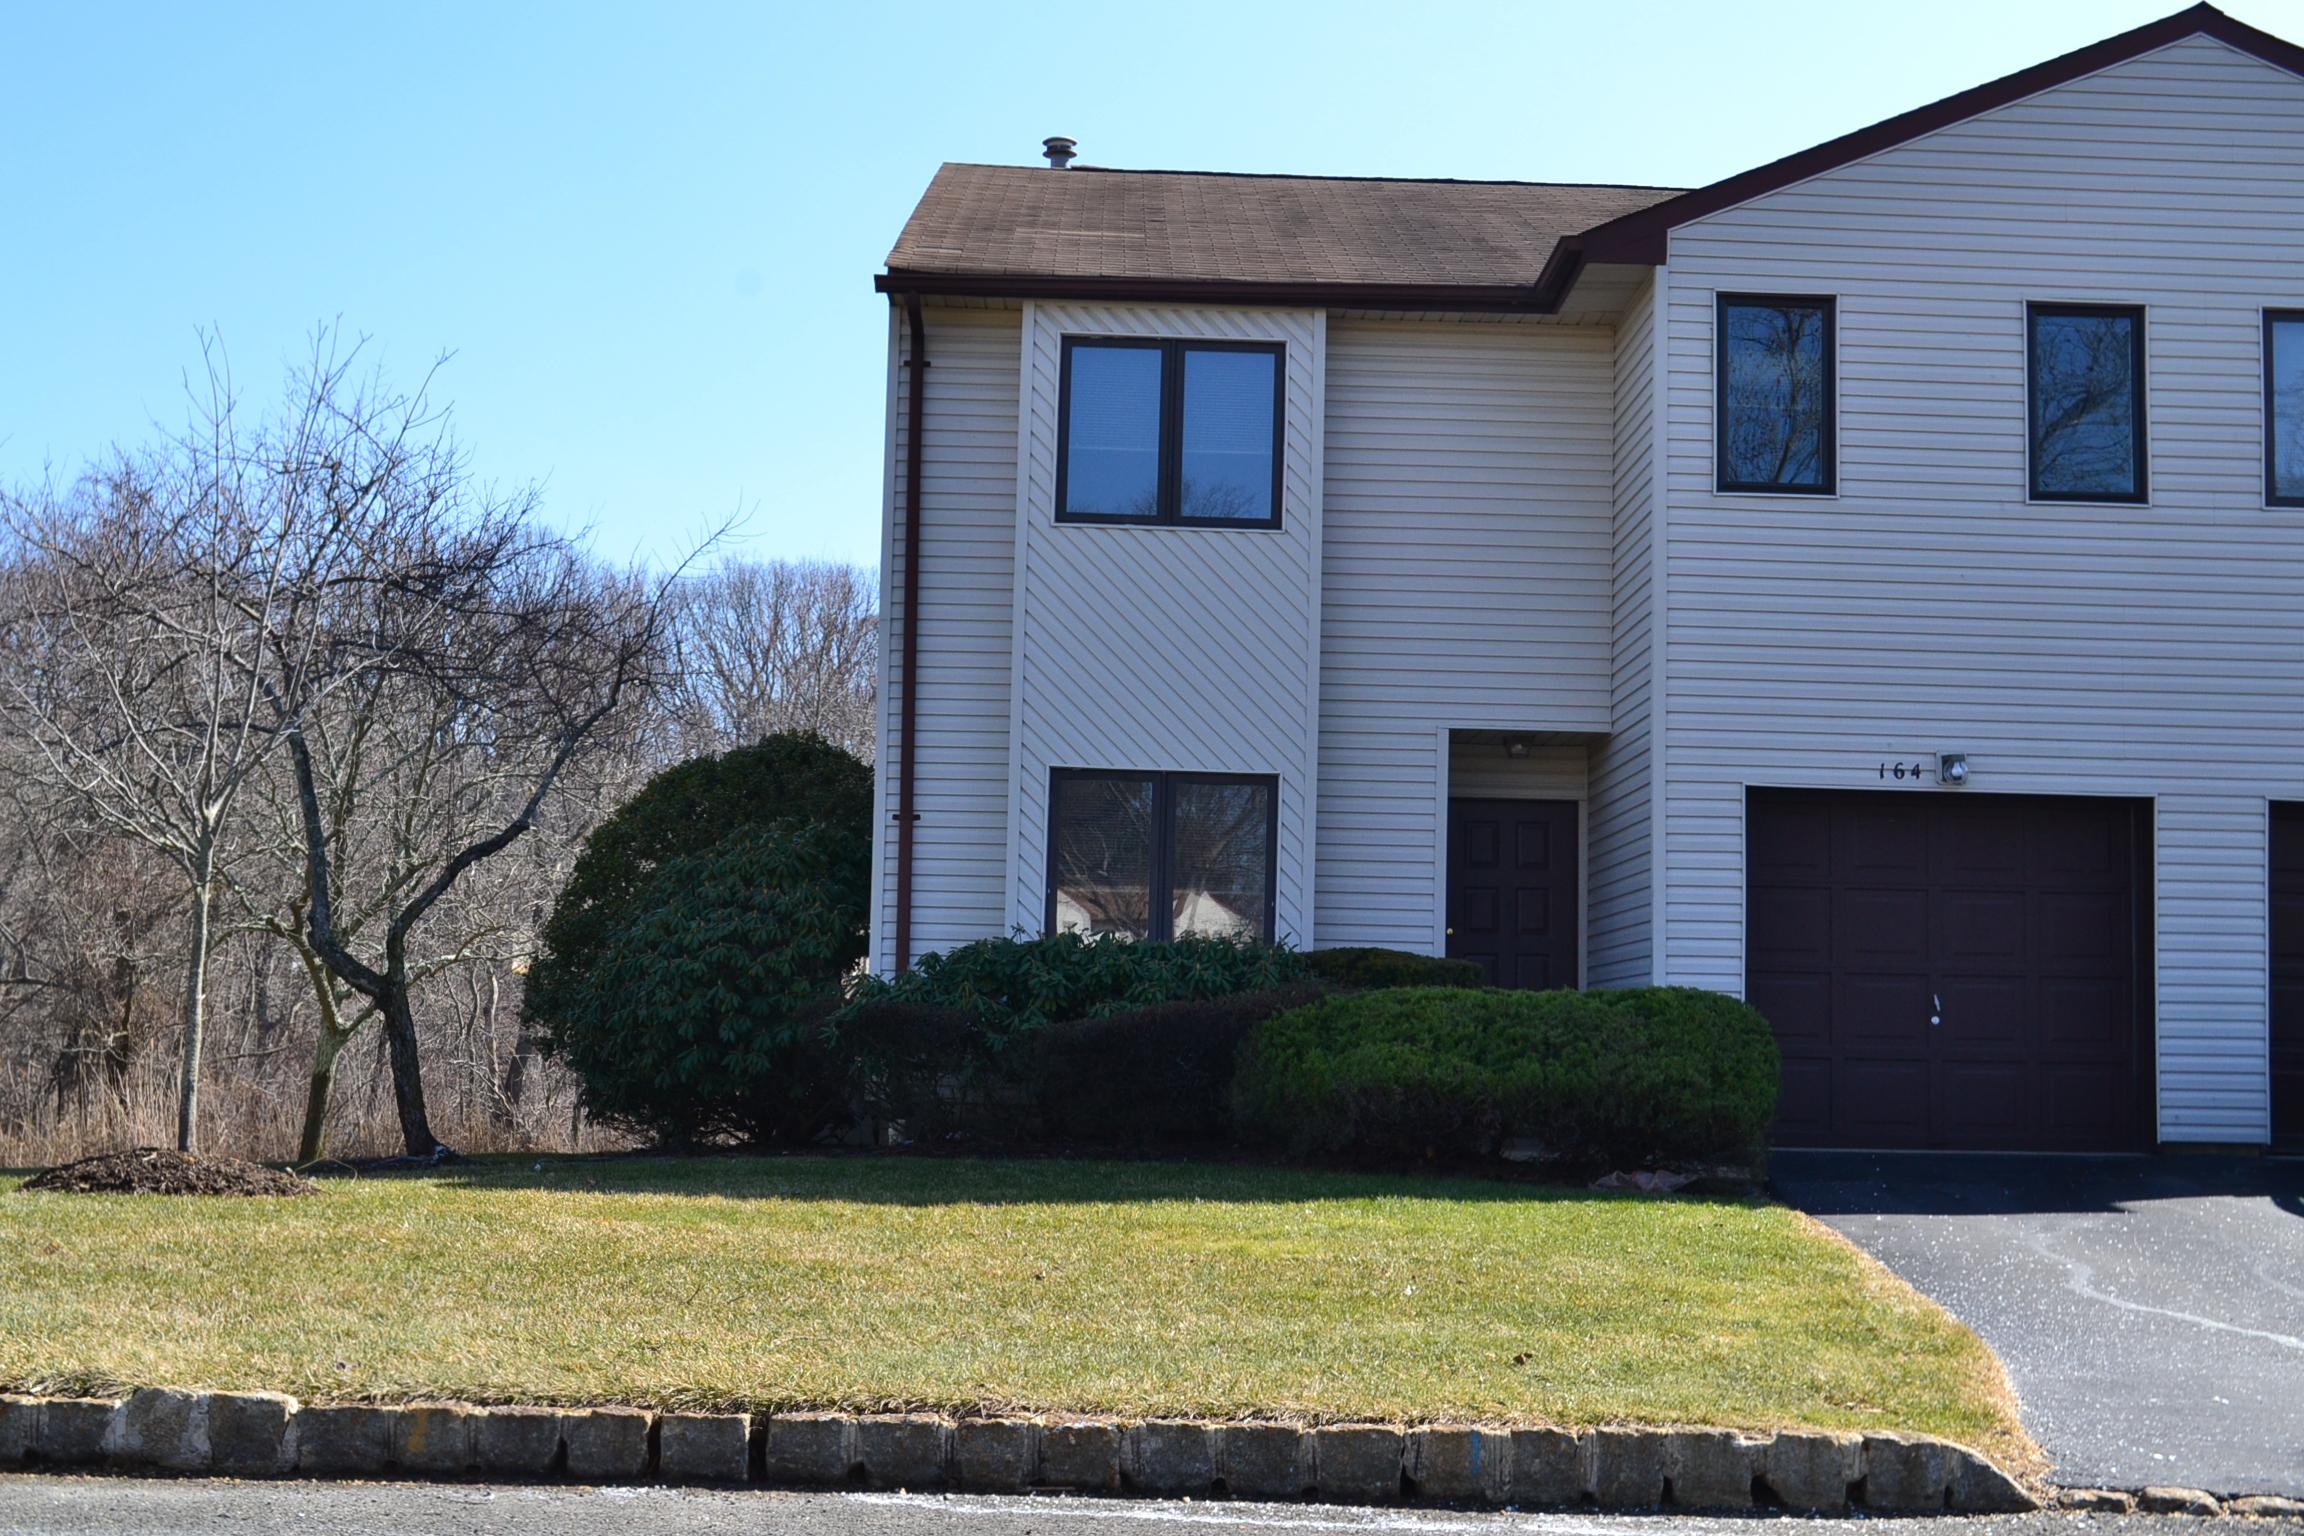 Condominium for Rent at Spacious End Unit! 164 Tangerine Drive Marlboro, New Jersey 07746 United States